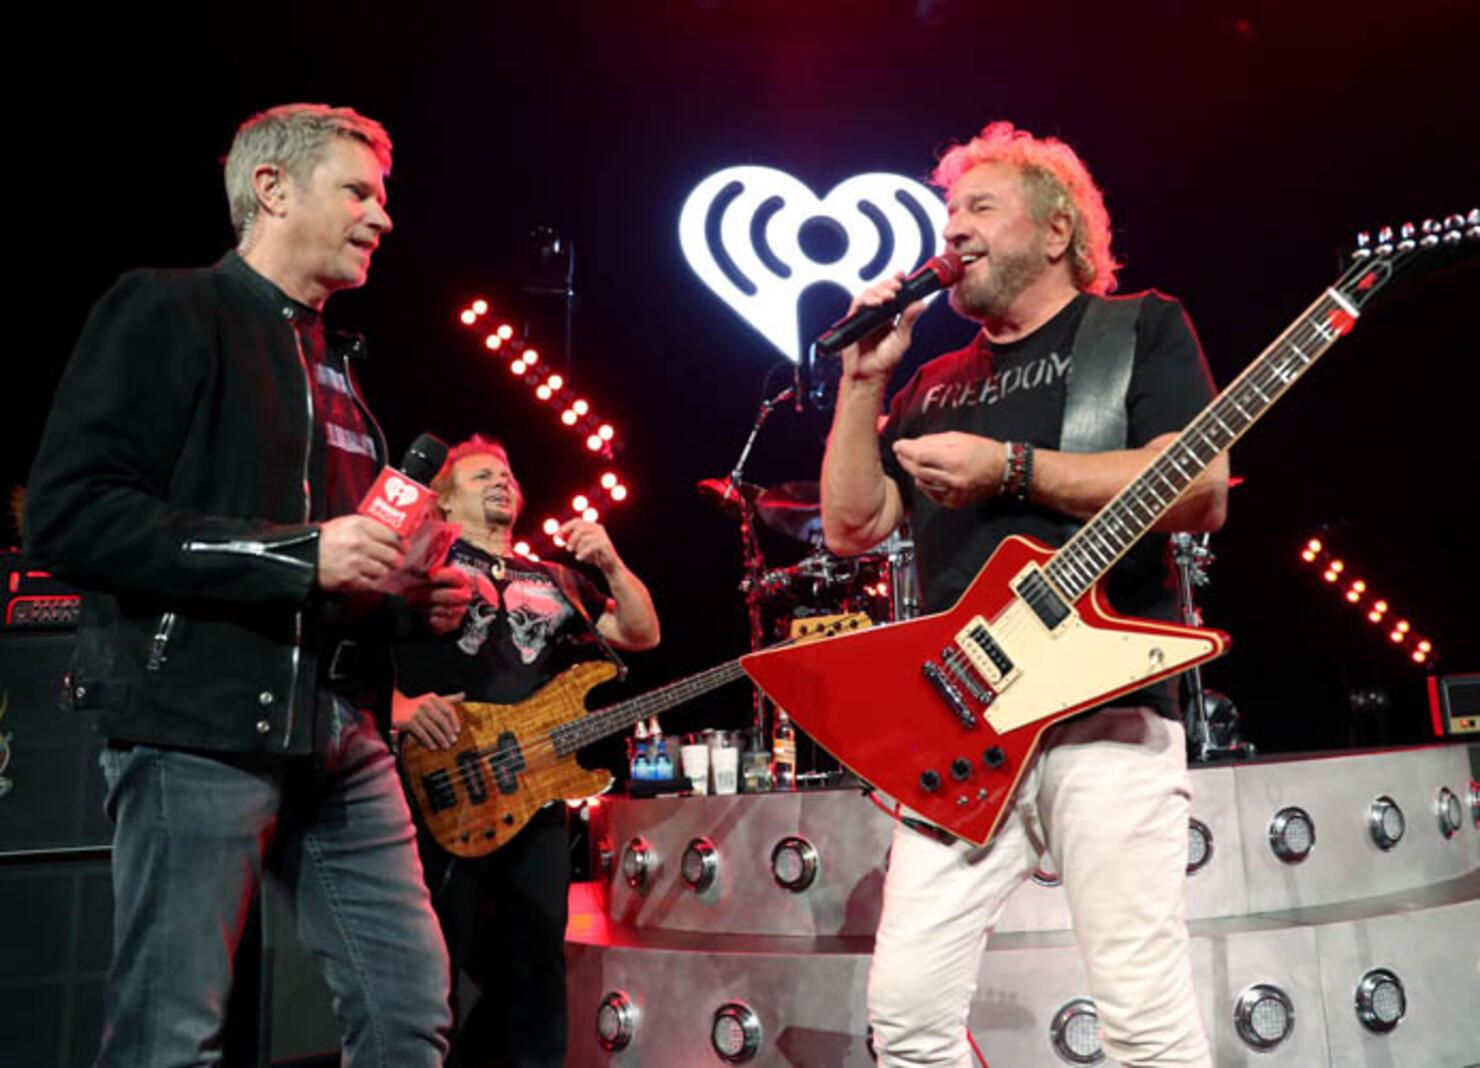 Photo: Rich Polk for iHeartRadio